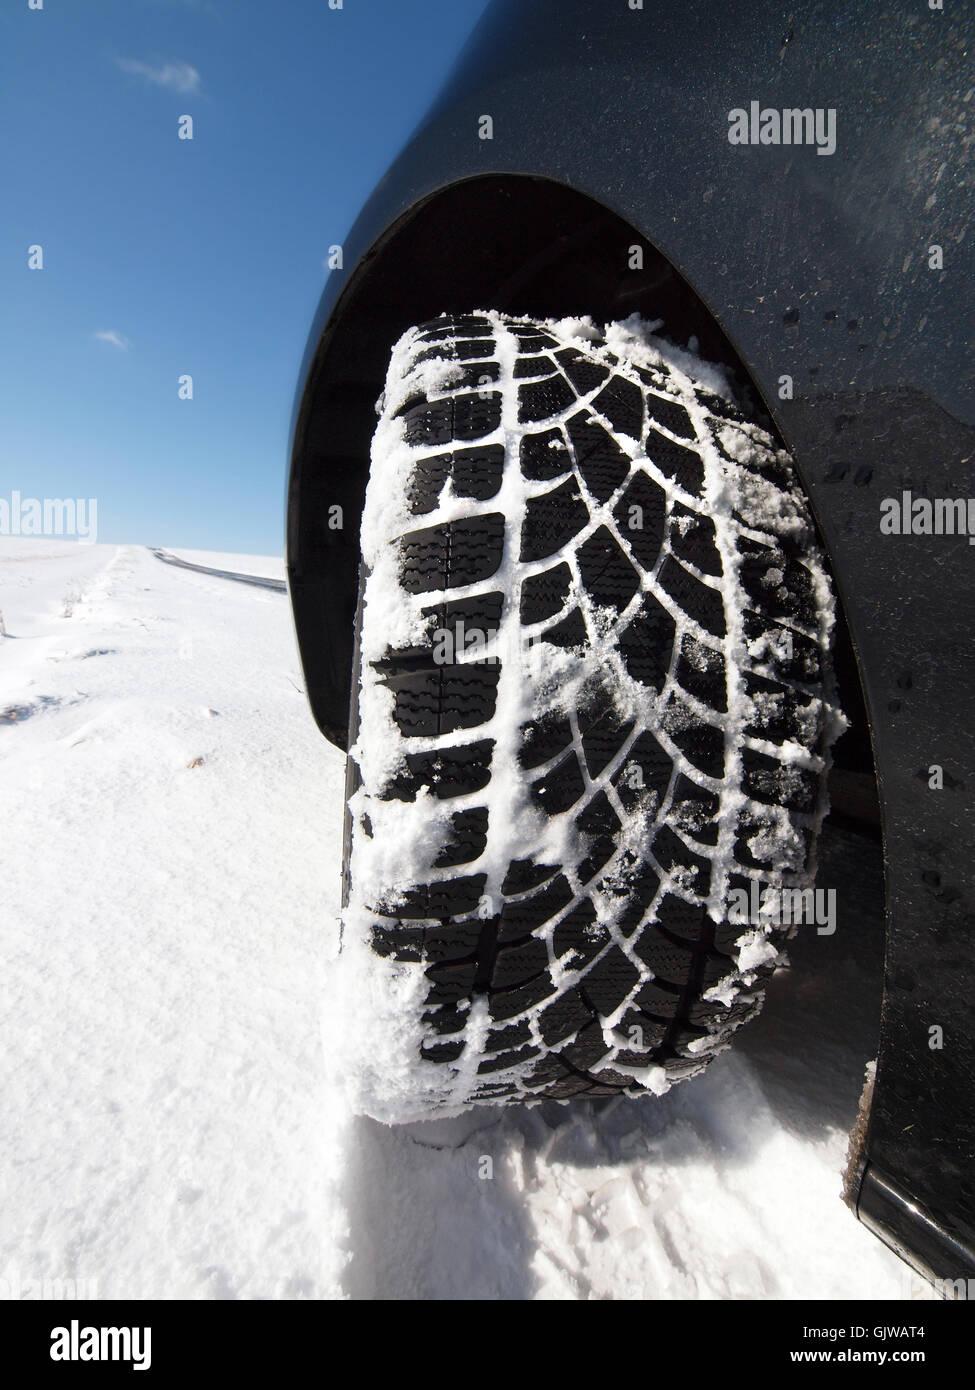 winter tires mandatory - Stock Image